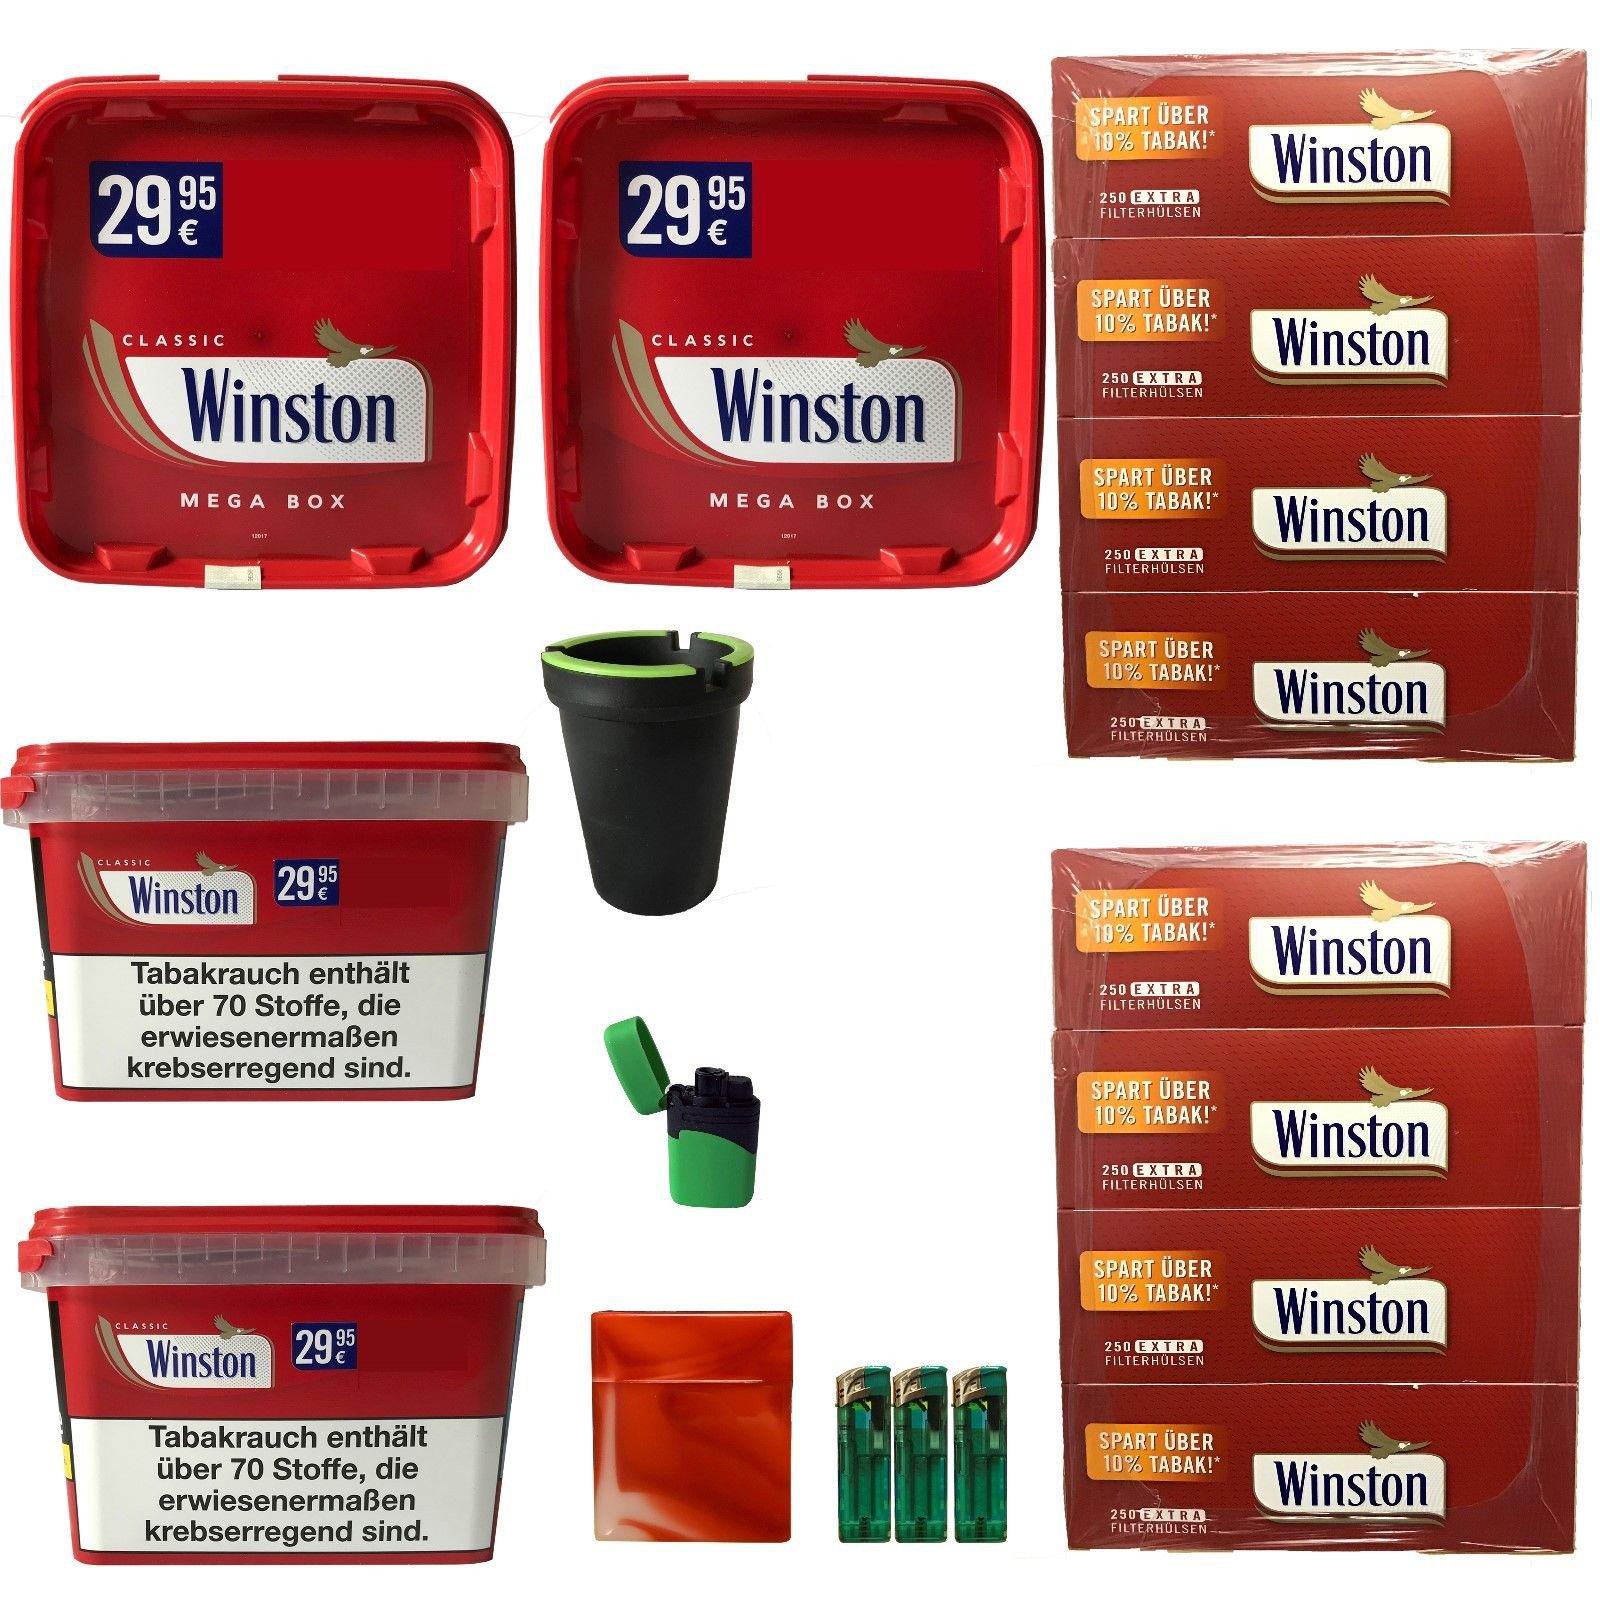 4 x Winston Volumentabak Mega Boxes 185g, Winston Extra Hülsen + Zubehör